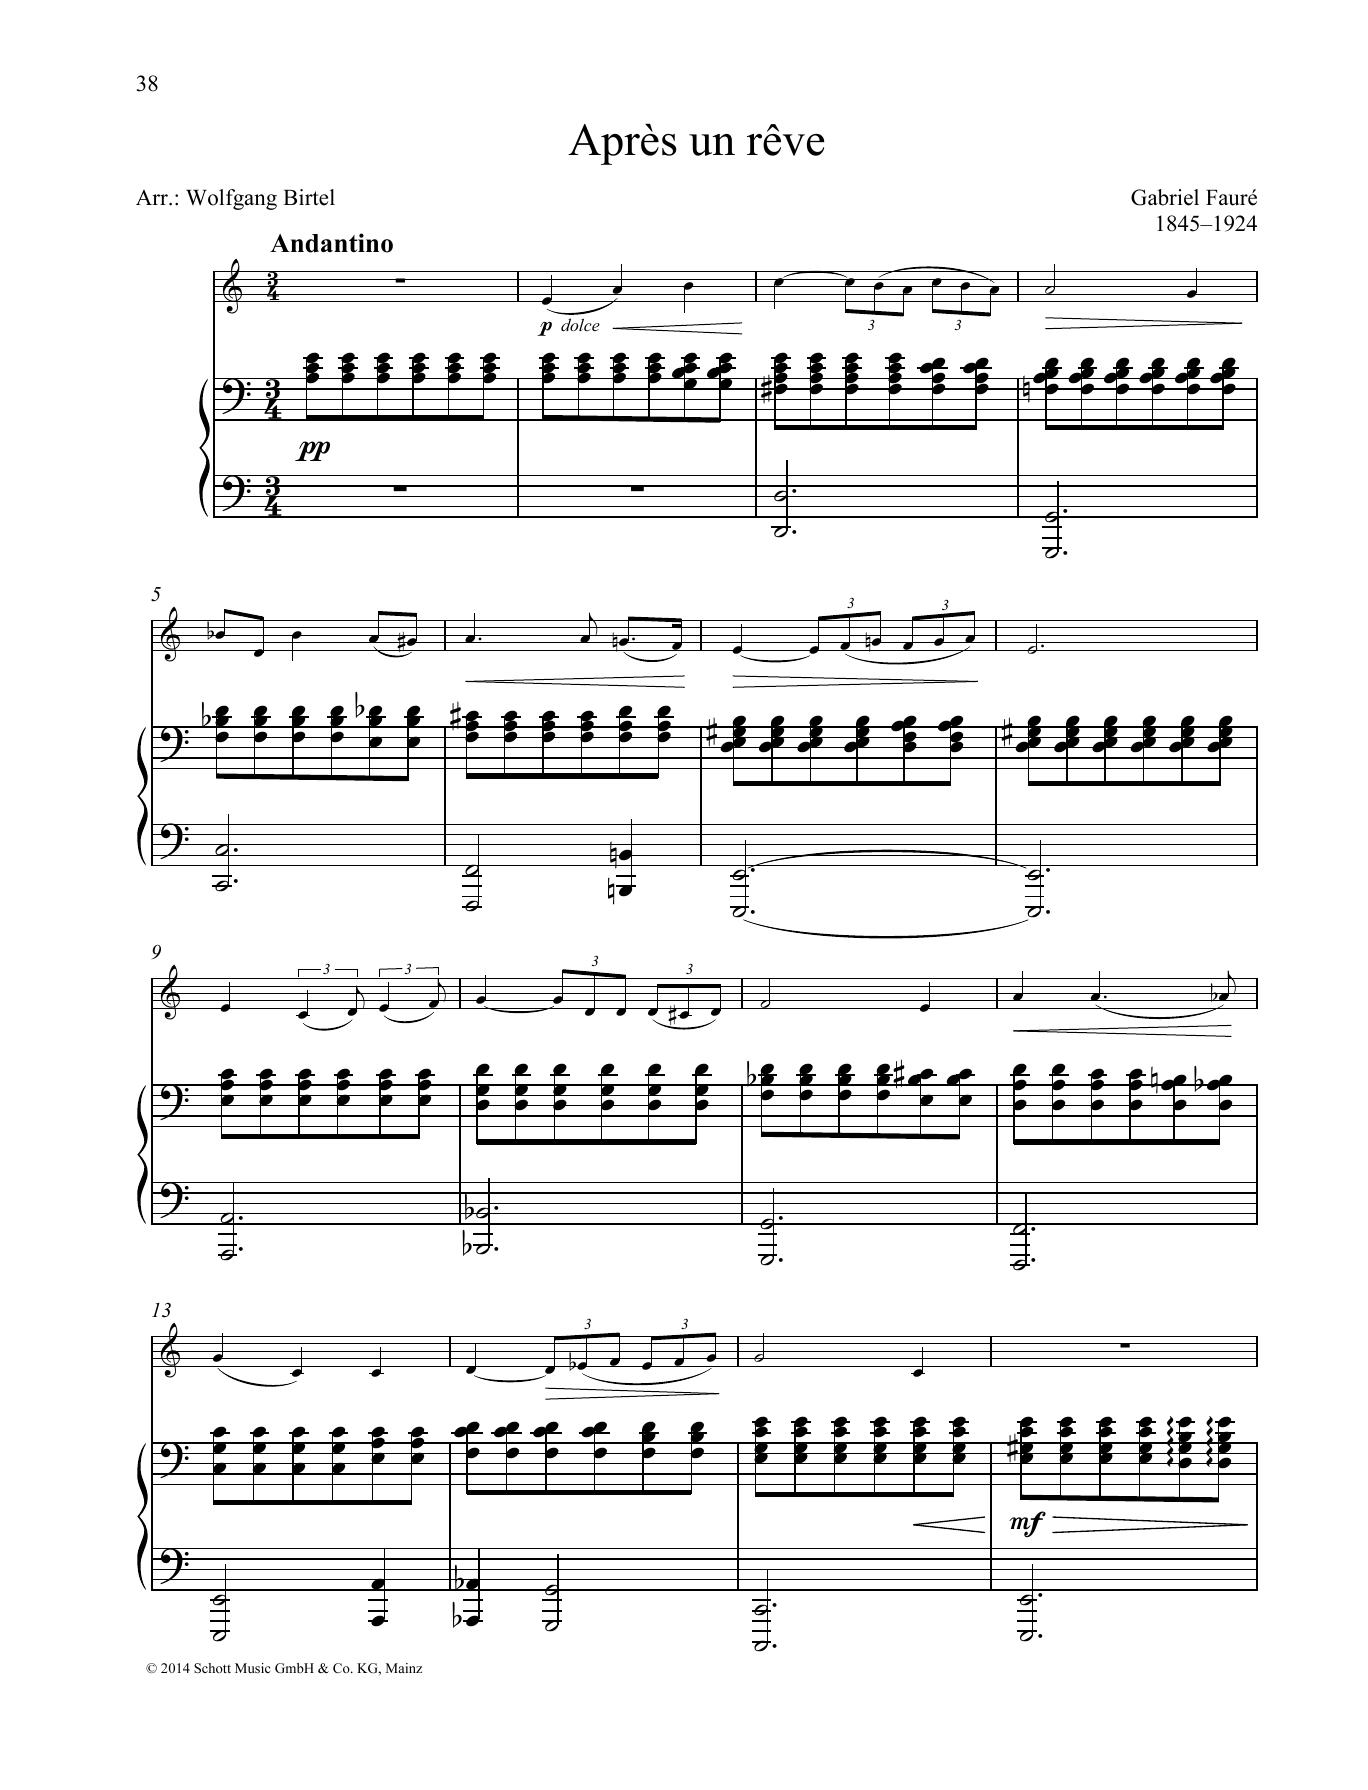 Gabriel Fauré Après un rêve sheet music preview music notes and score for Brass Solo including 4 page(s)